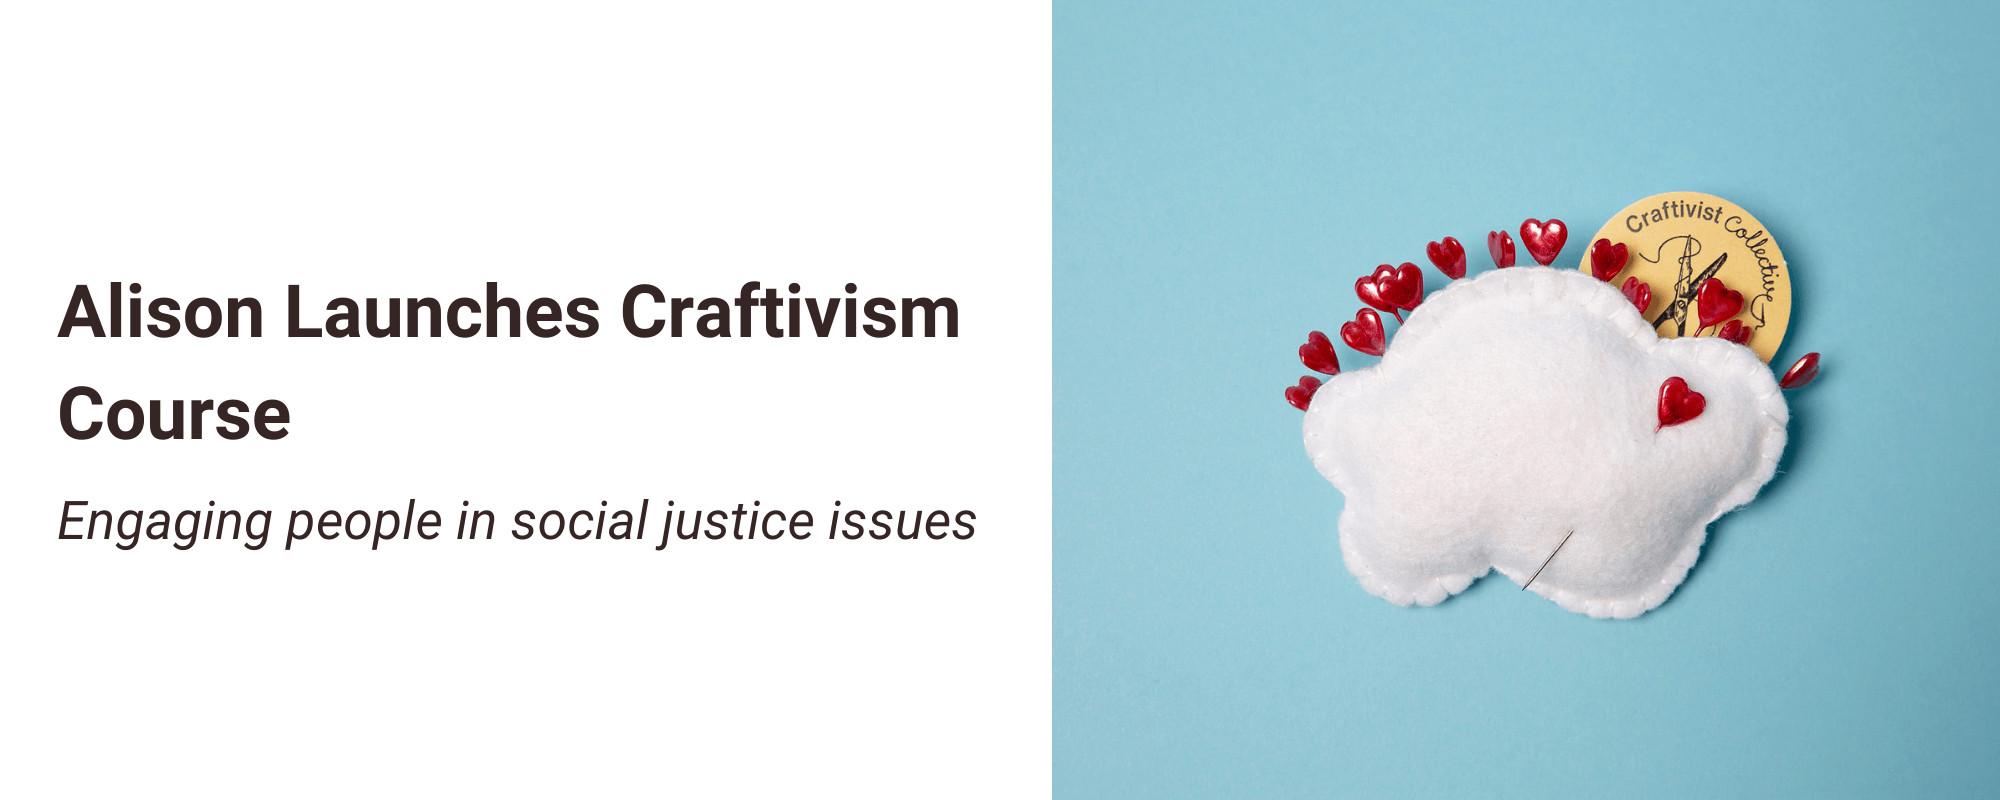 Alison launches Craftivism course